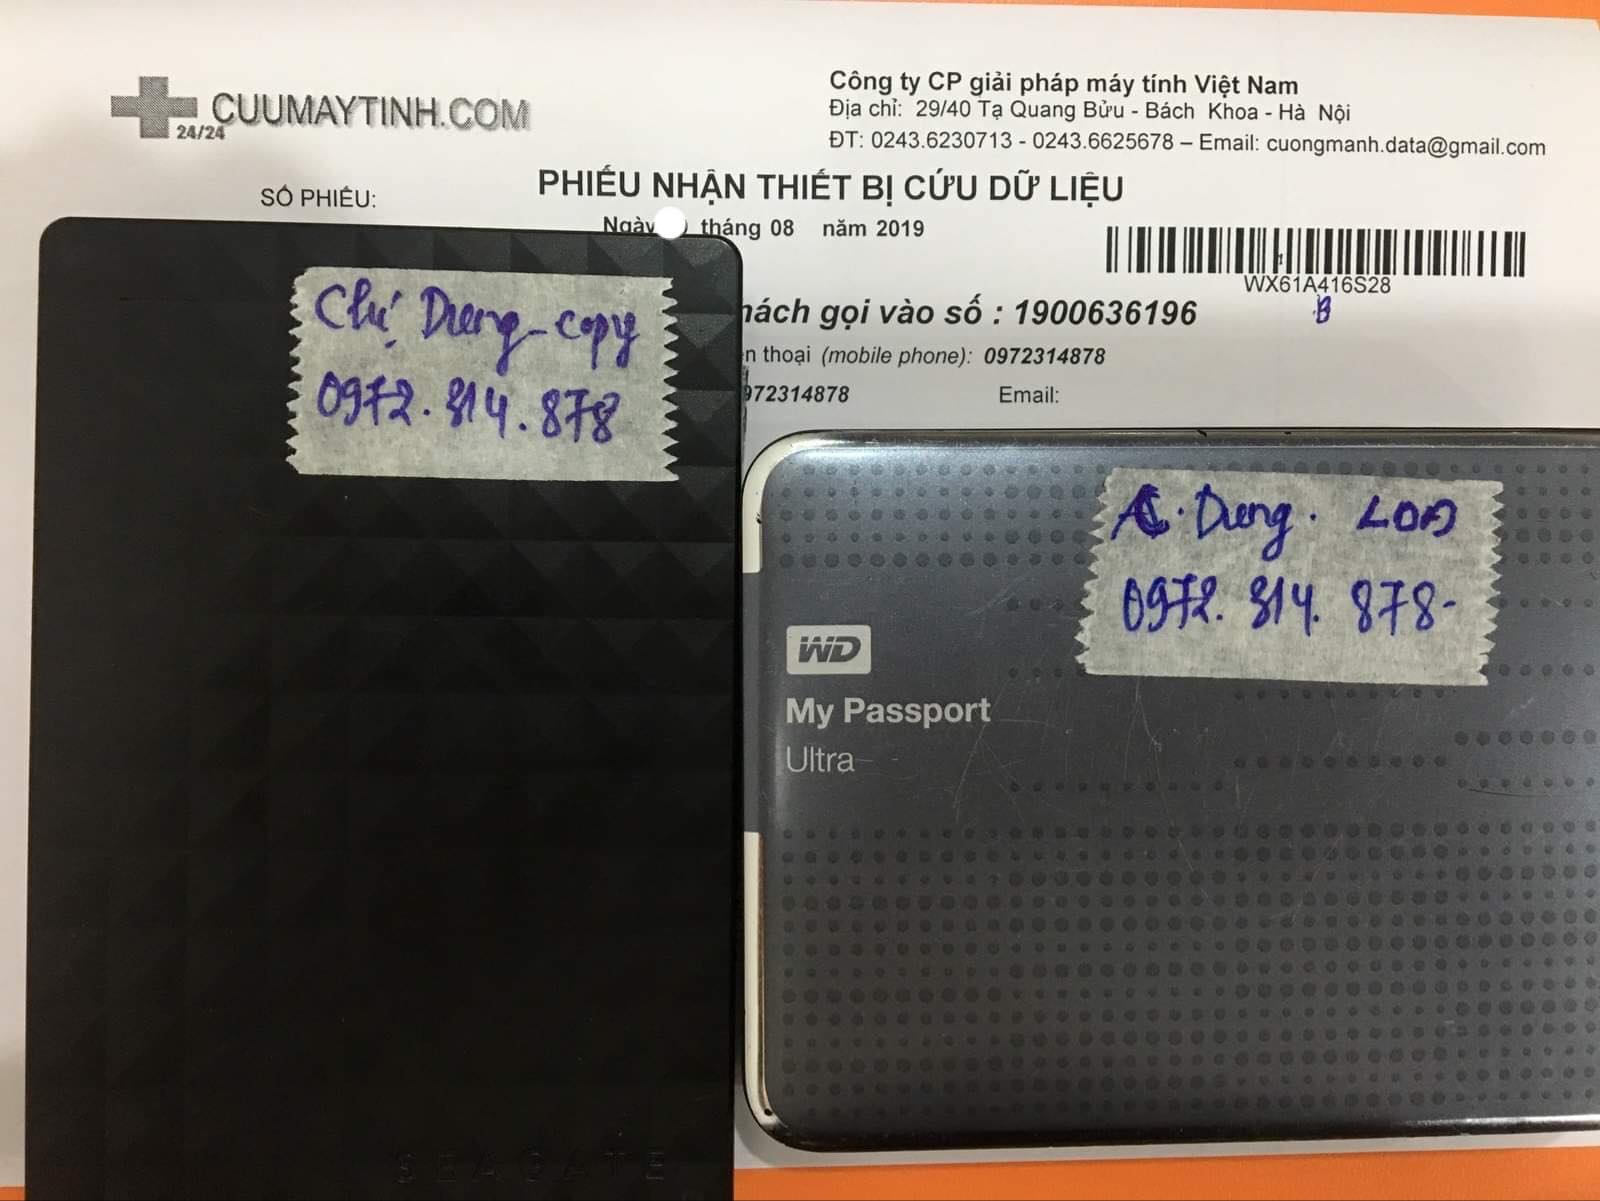 Lấy dữ liệu ổ cứng Western 1TB lỗi đầu đọc 28/08/2019 - cuumaytinh